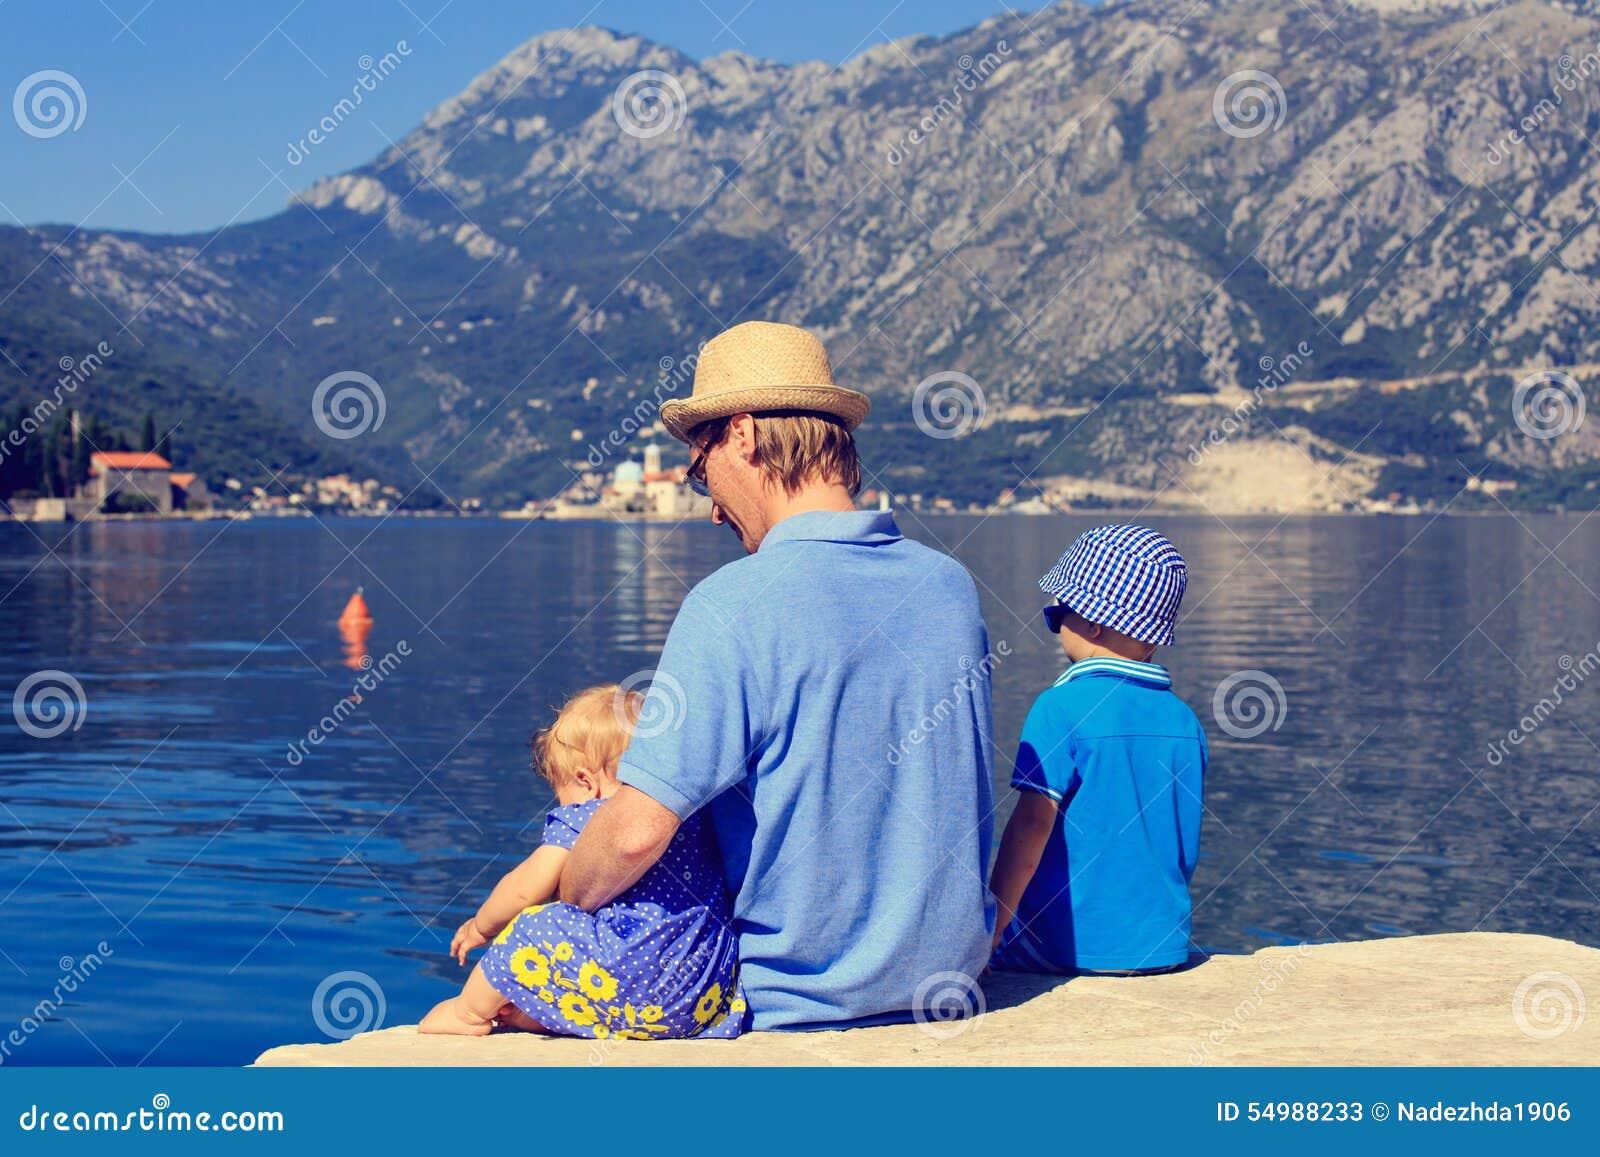 Avla med ungar som ser scenisk sikt i Perast